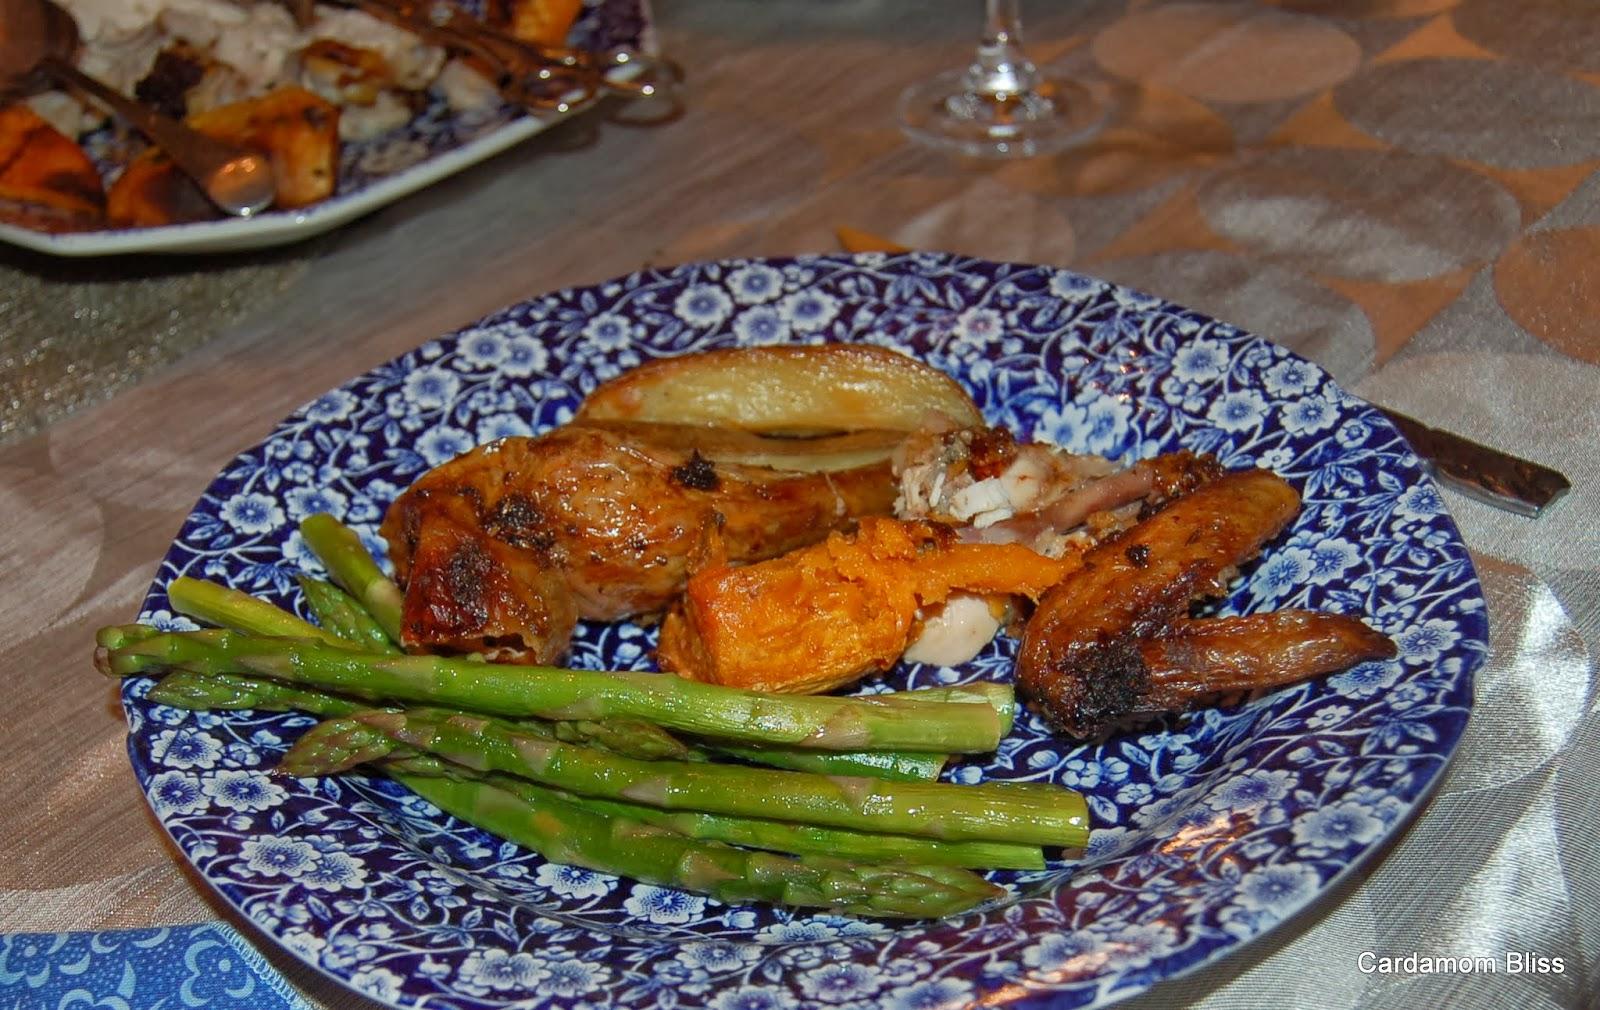 Roast Chicken with Seville Orange and Rosebud Masala